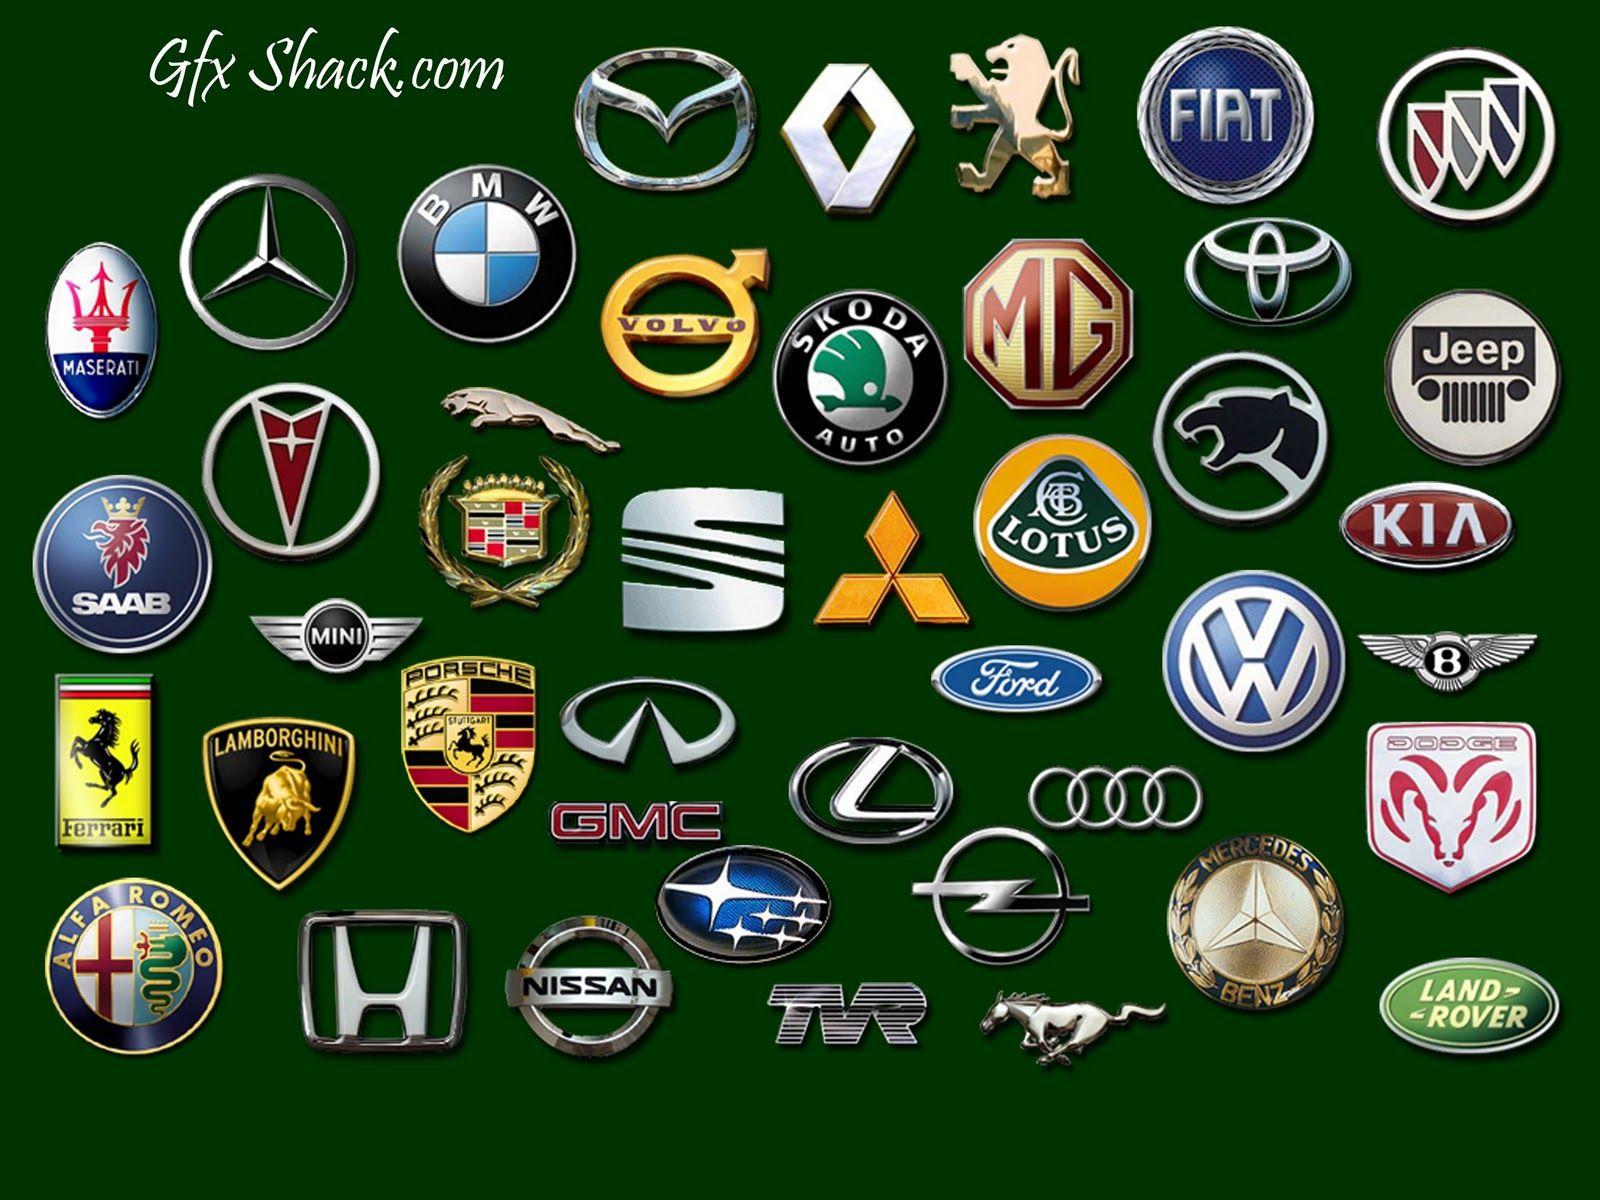 Car Logos Azs Cars Car Logos Pinterest Car Logos - Car signs and namescar logos with wings azs cars